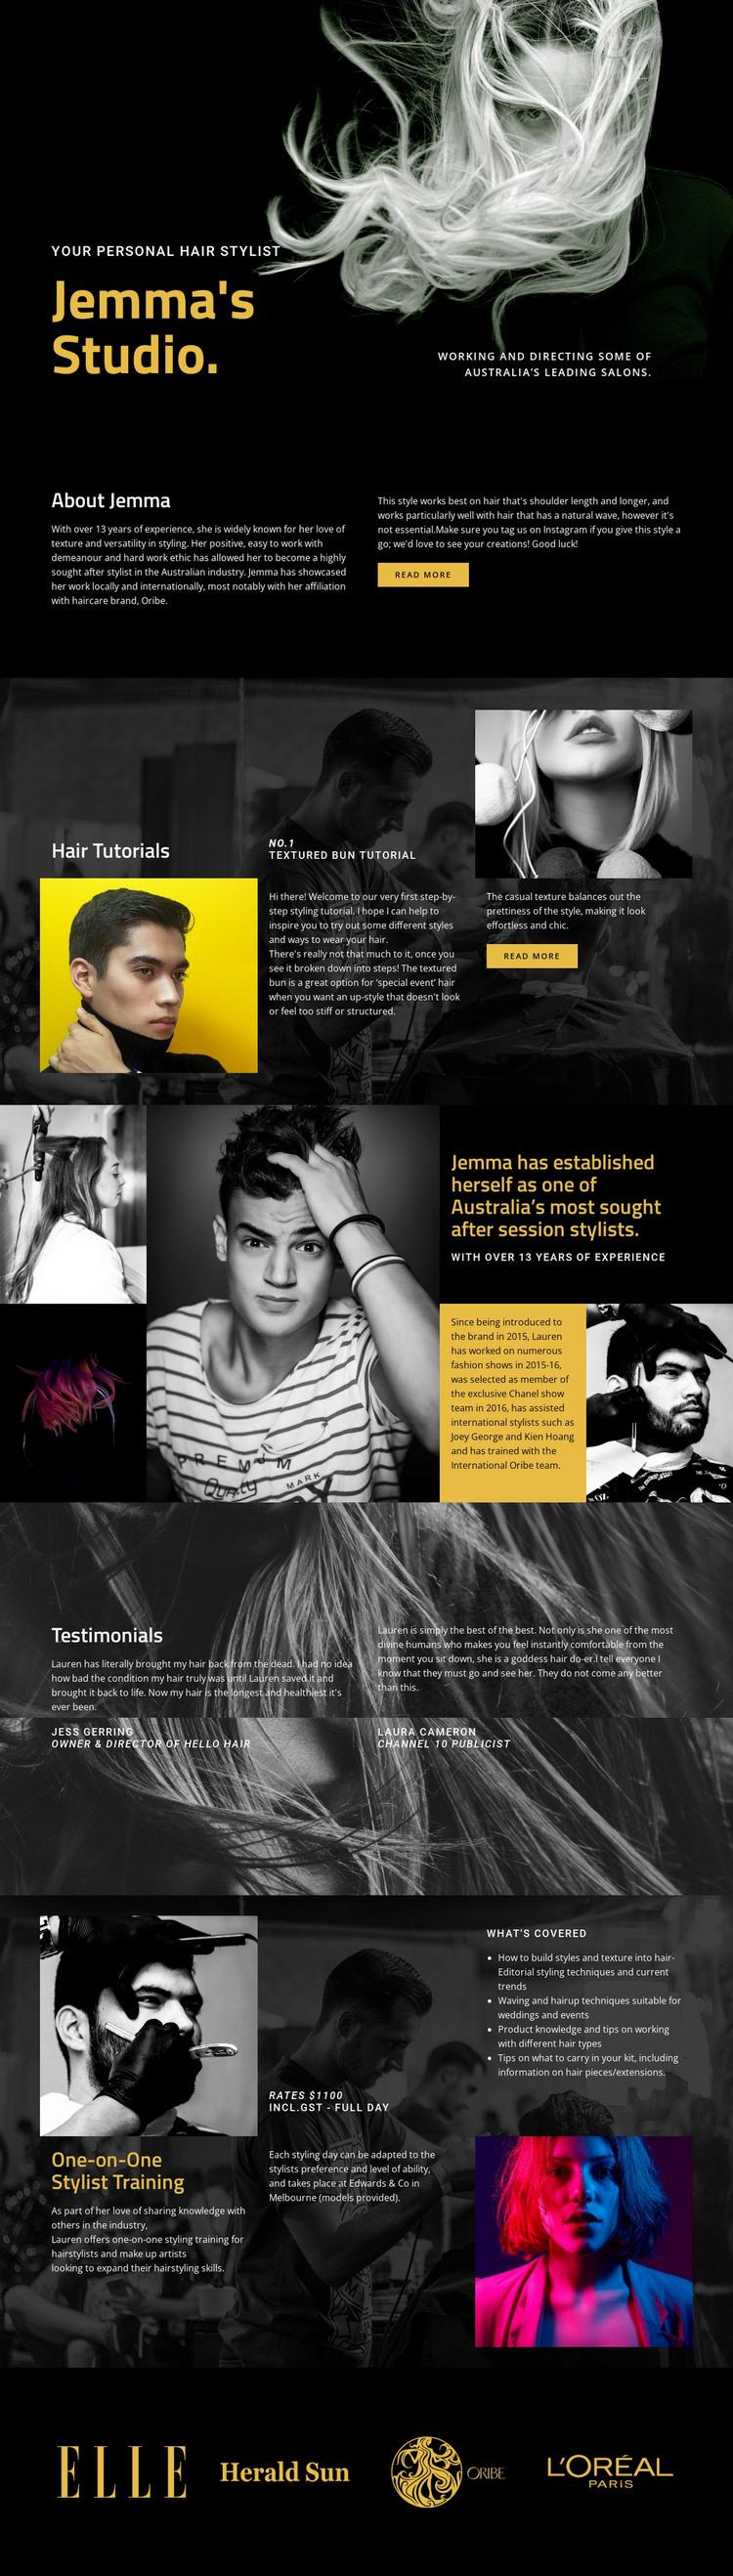 Winning ideas for fashion WordPress Theme